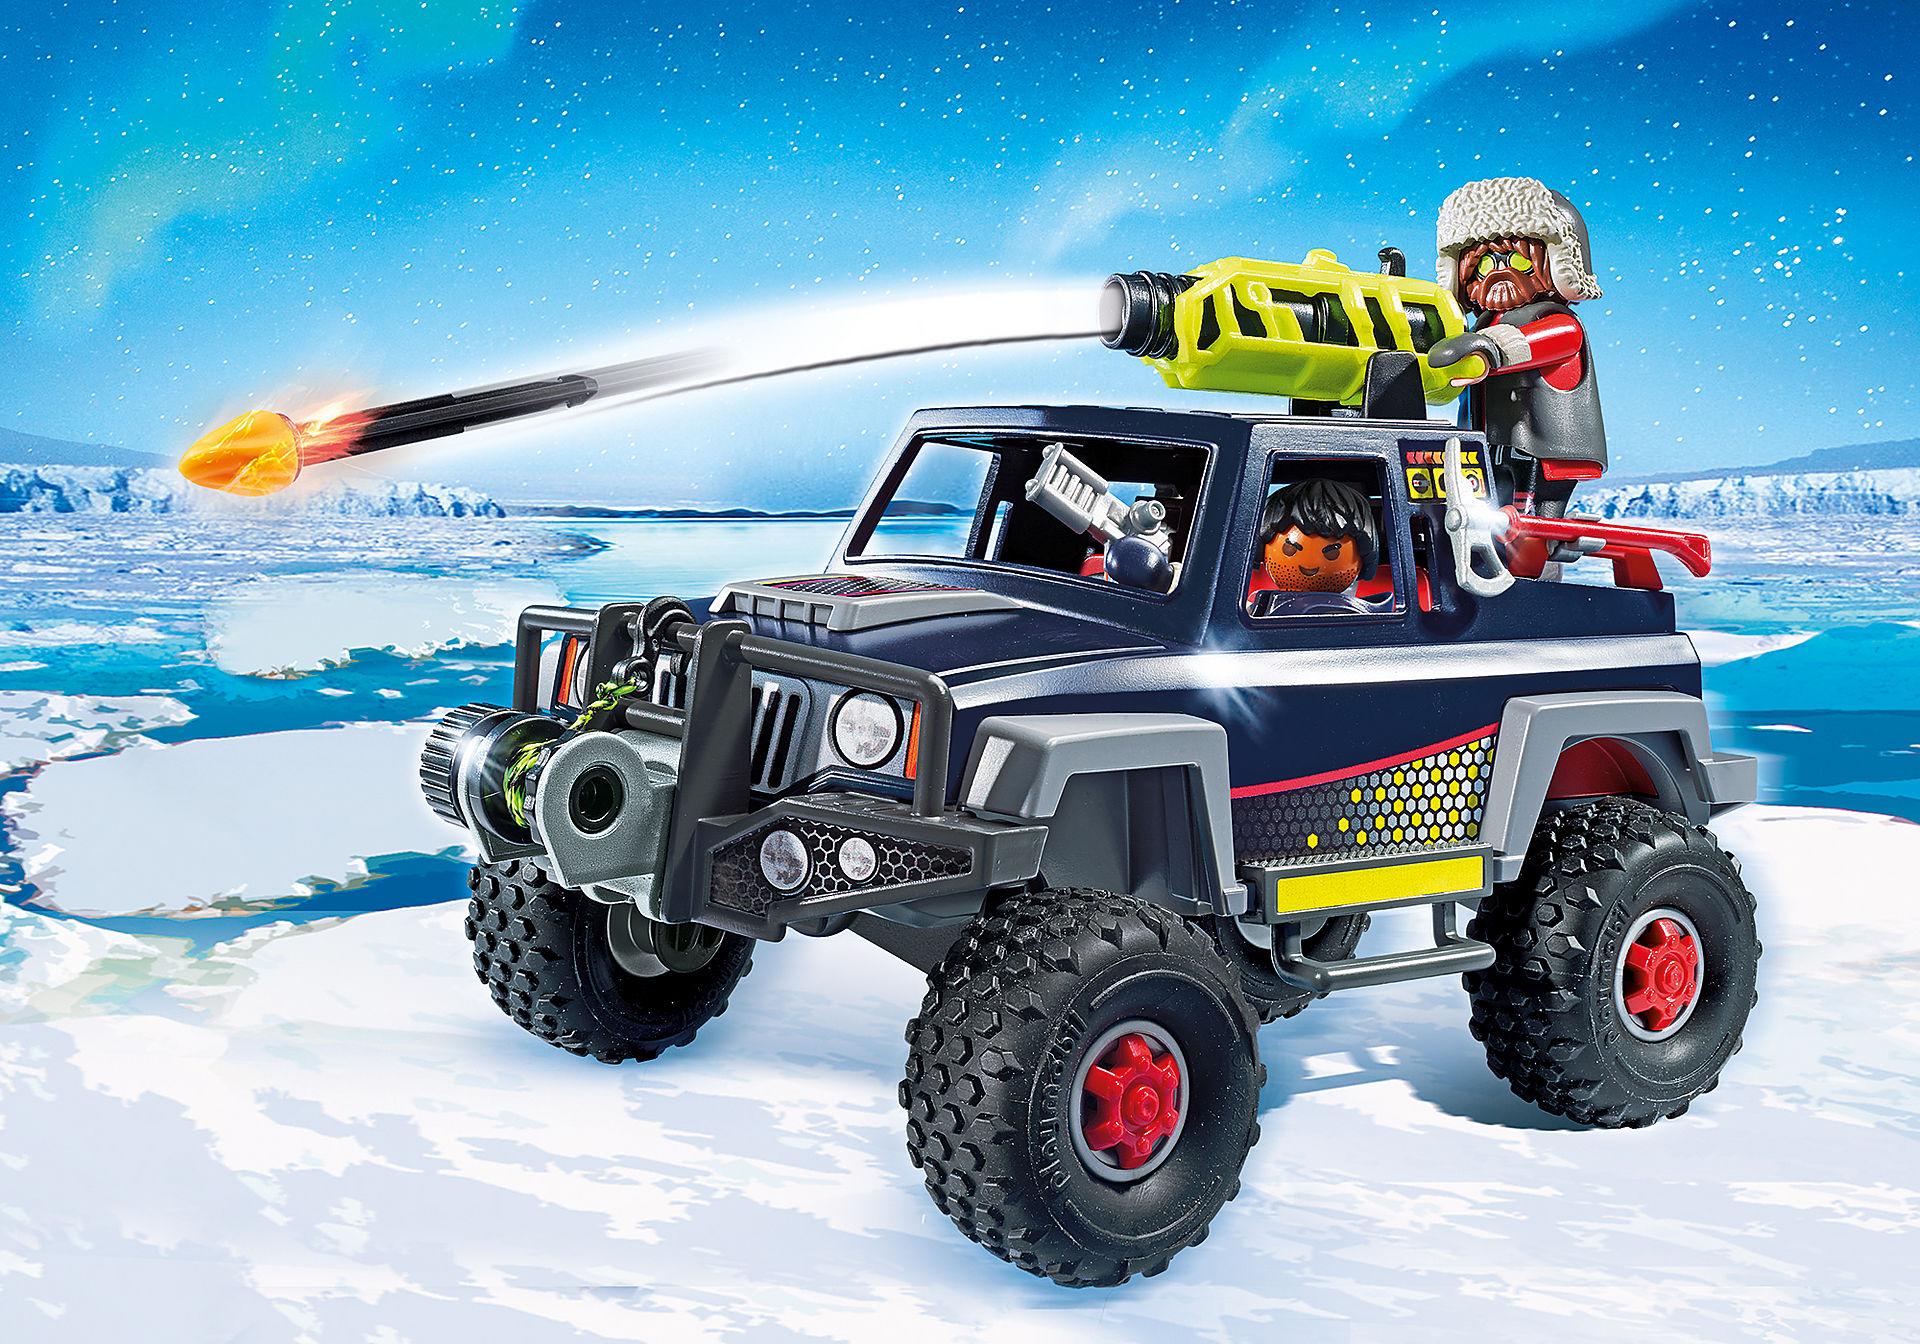 http://media.playmobil.com/i/playmobil/9059_product_detail/Eispiraten-Truck